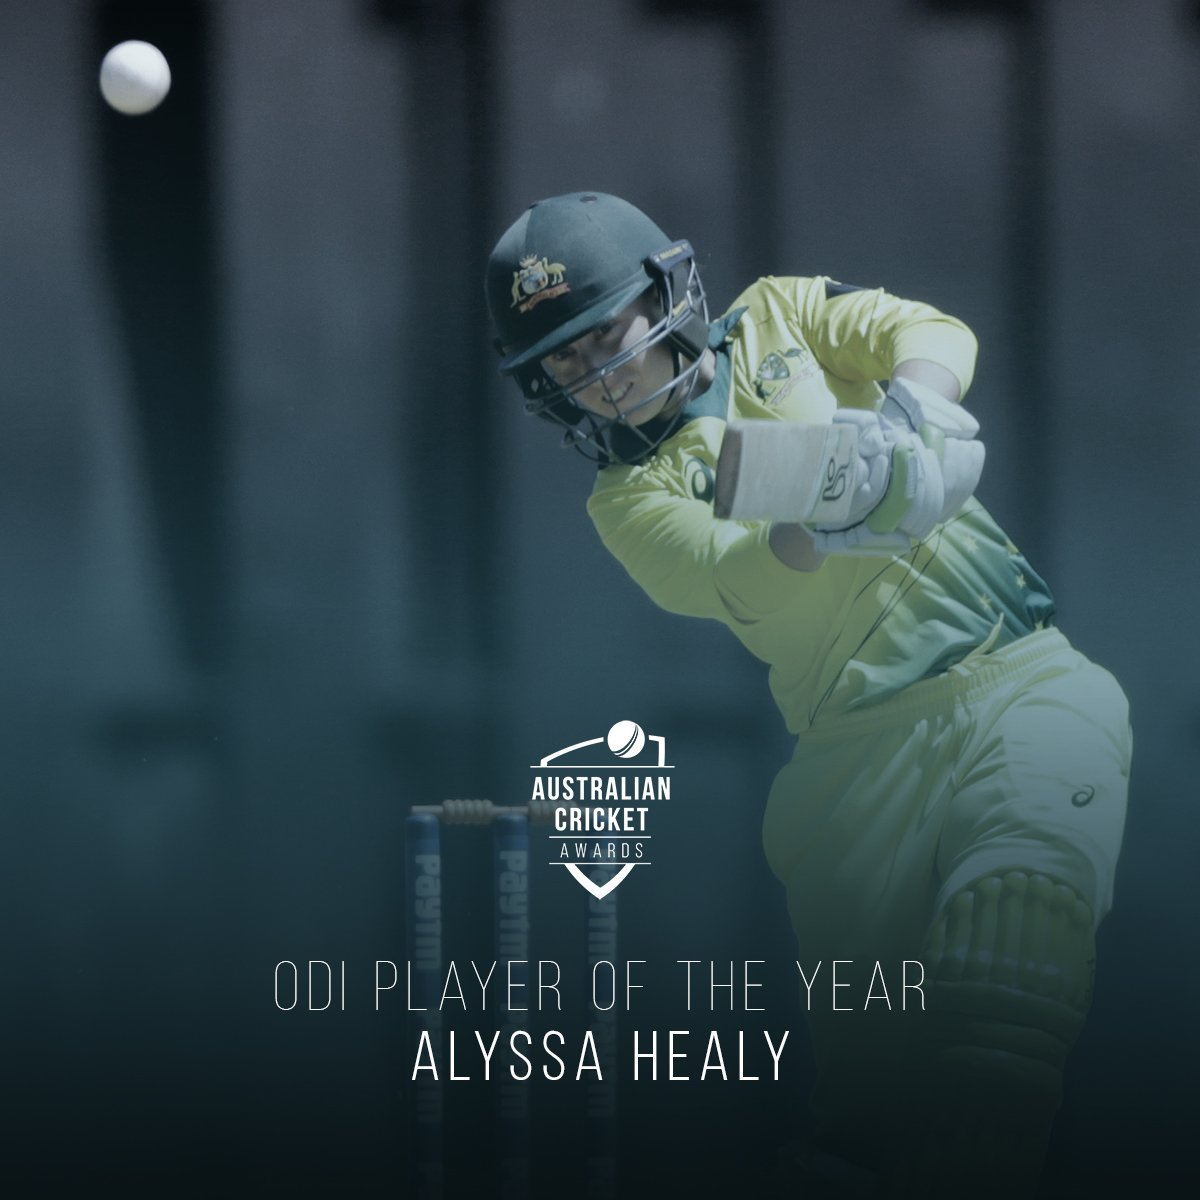 cricket.com.au's photo on Alyssa Healy